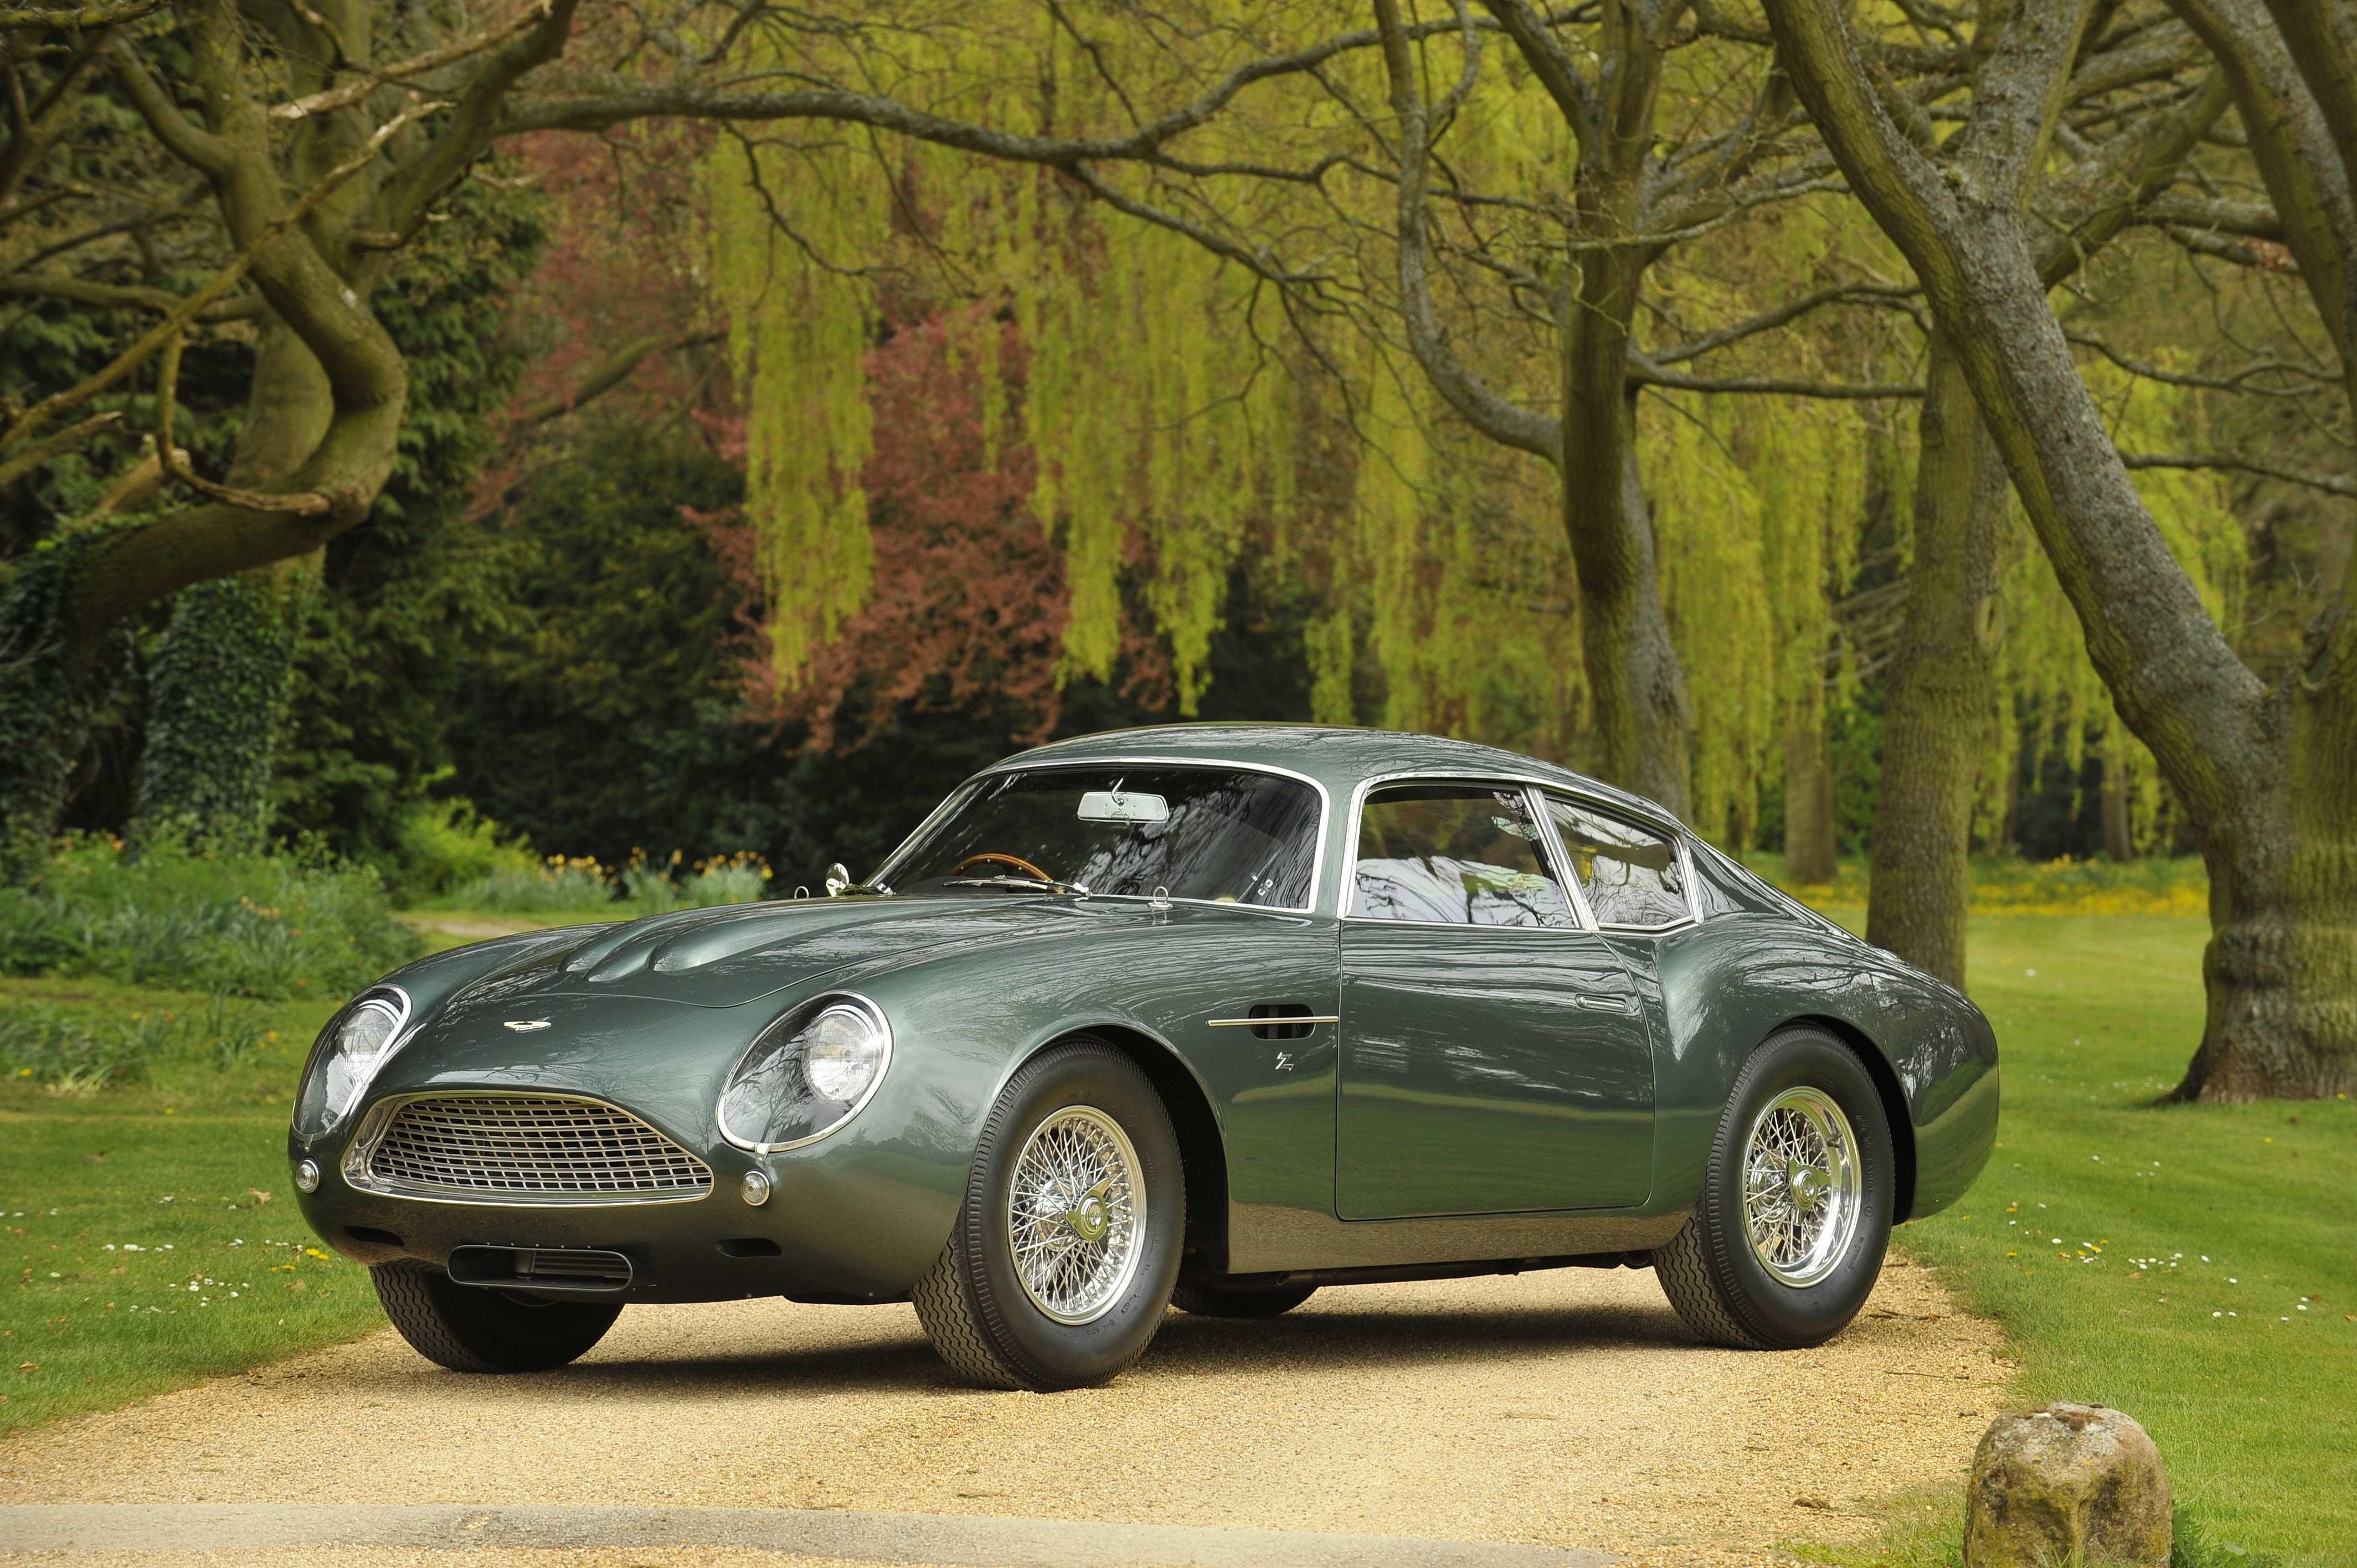 1962 Aston Martin Db4 Gt Zagato Sportwagen Hot